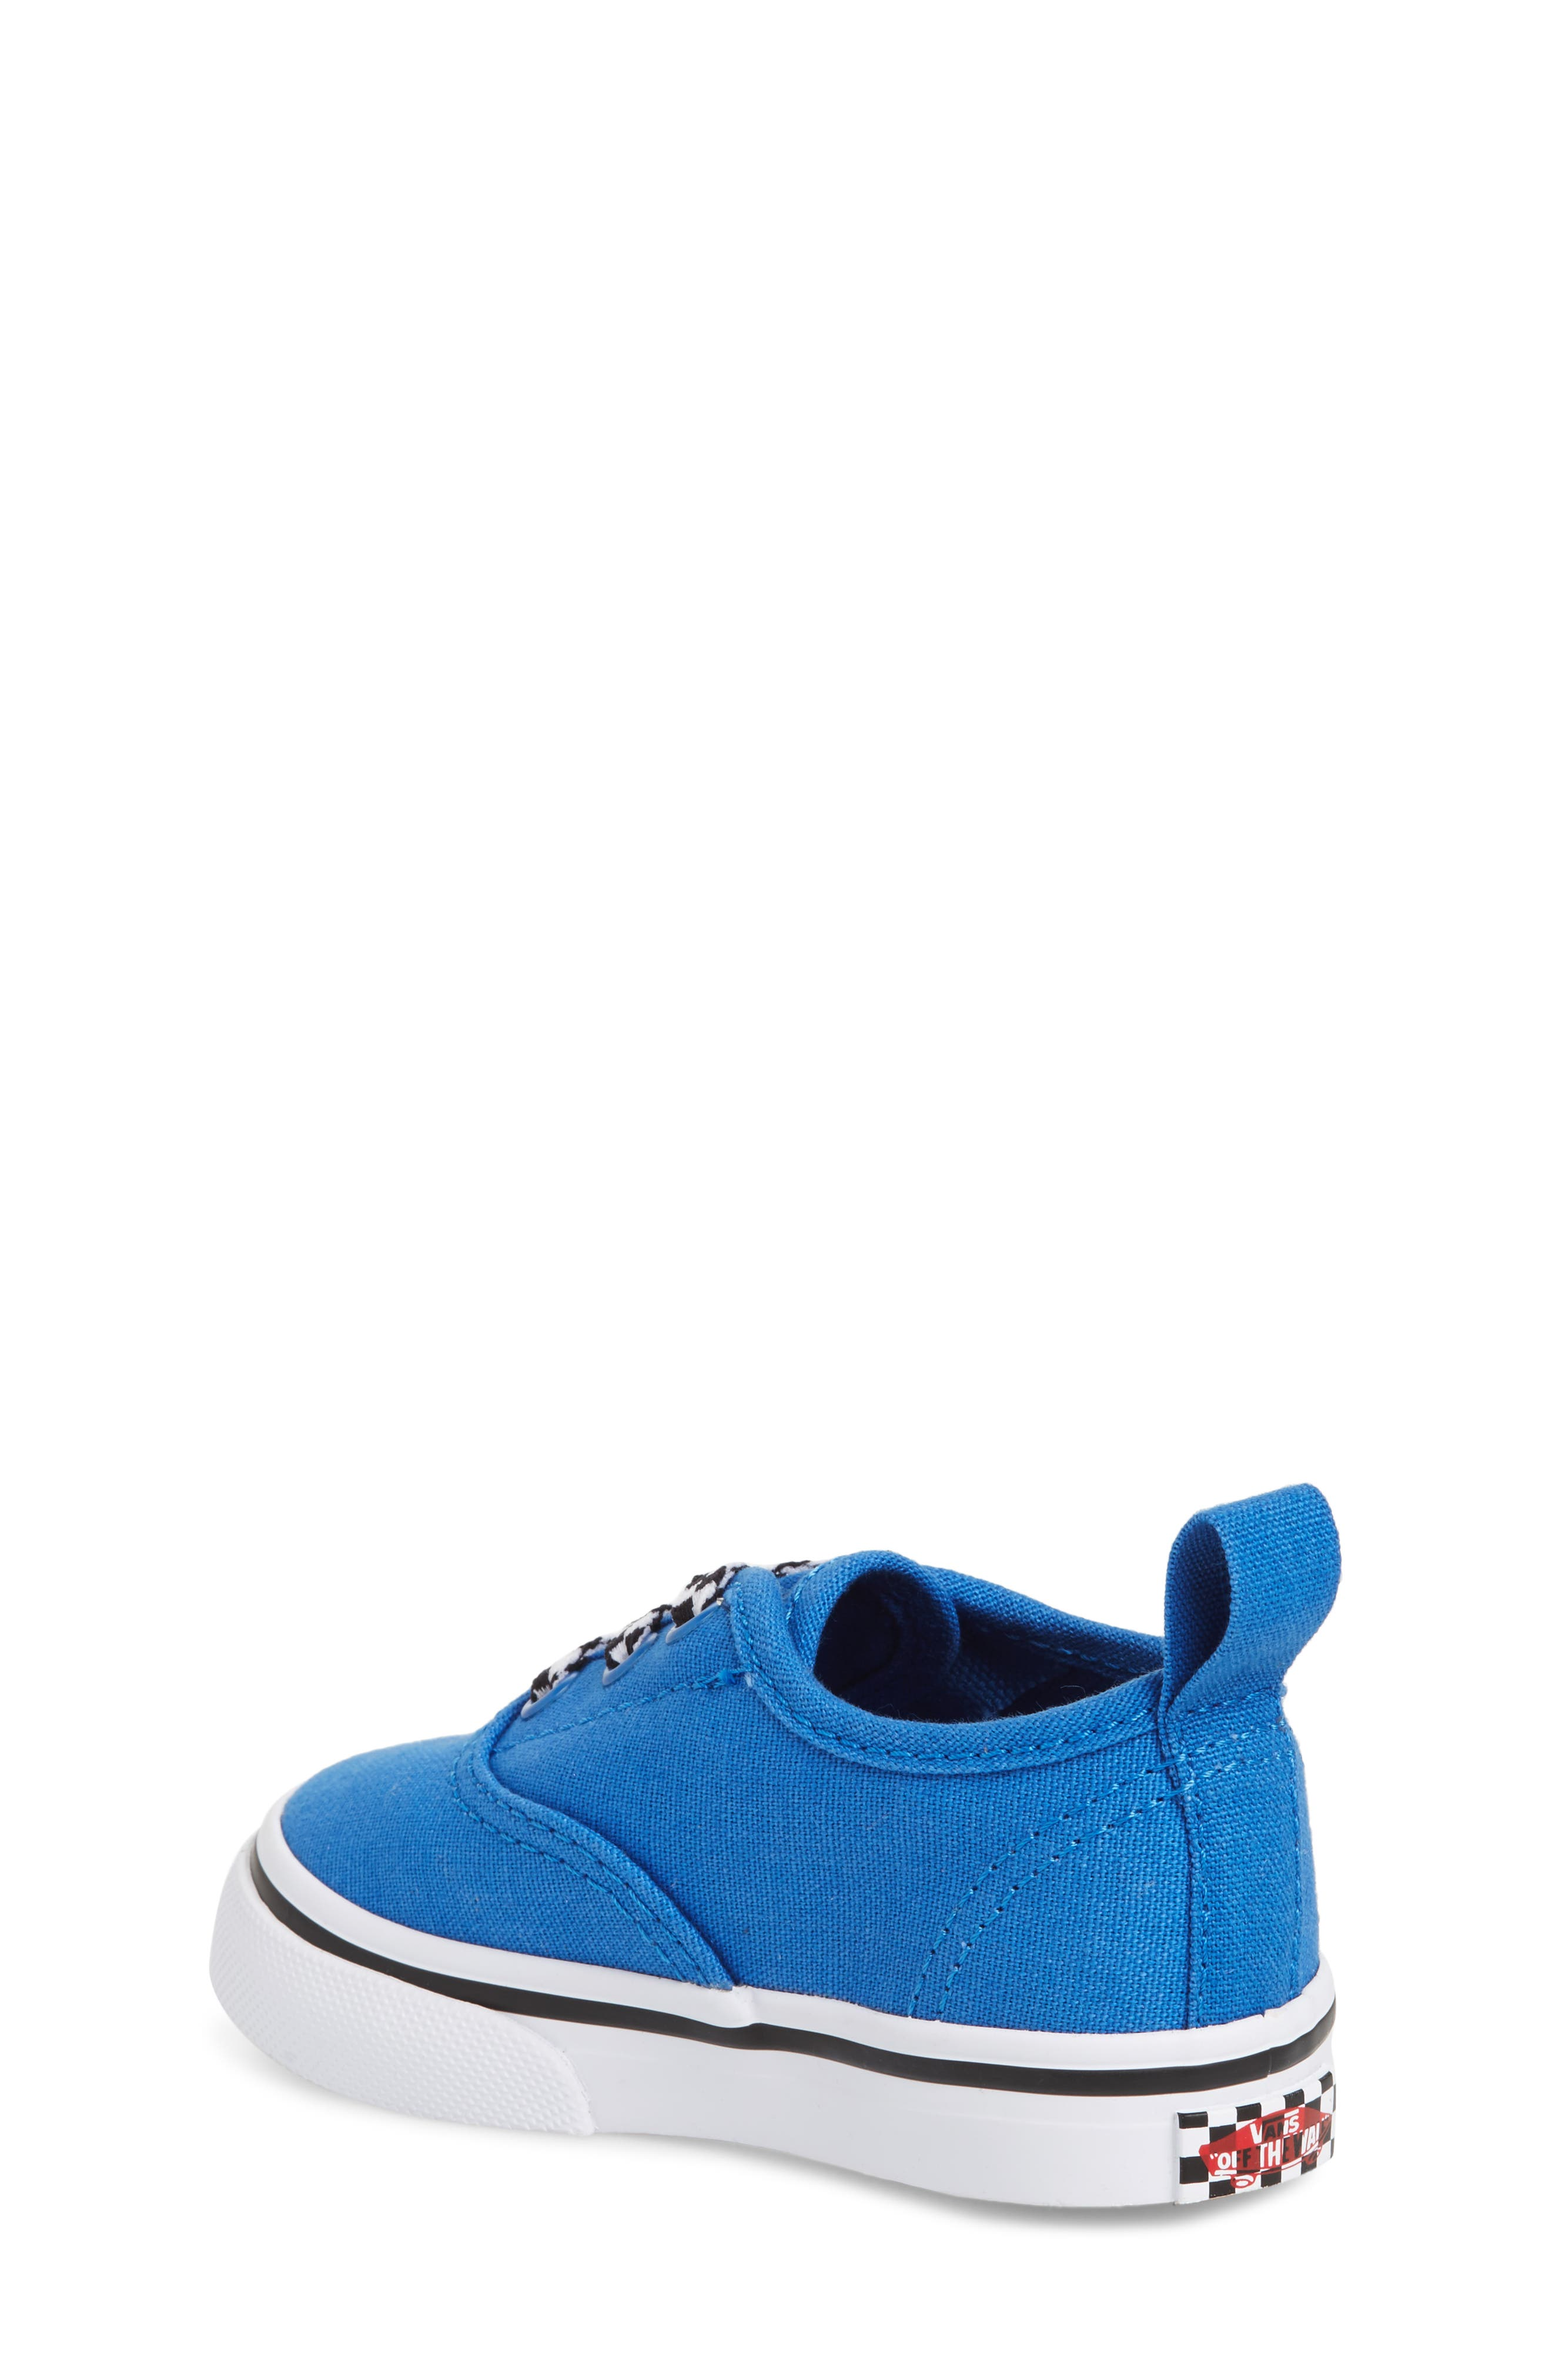 Authentic Sneaker,                             Alternate thumbnail 2, color,                             Blue/ White Check Lace